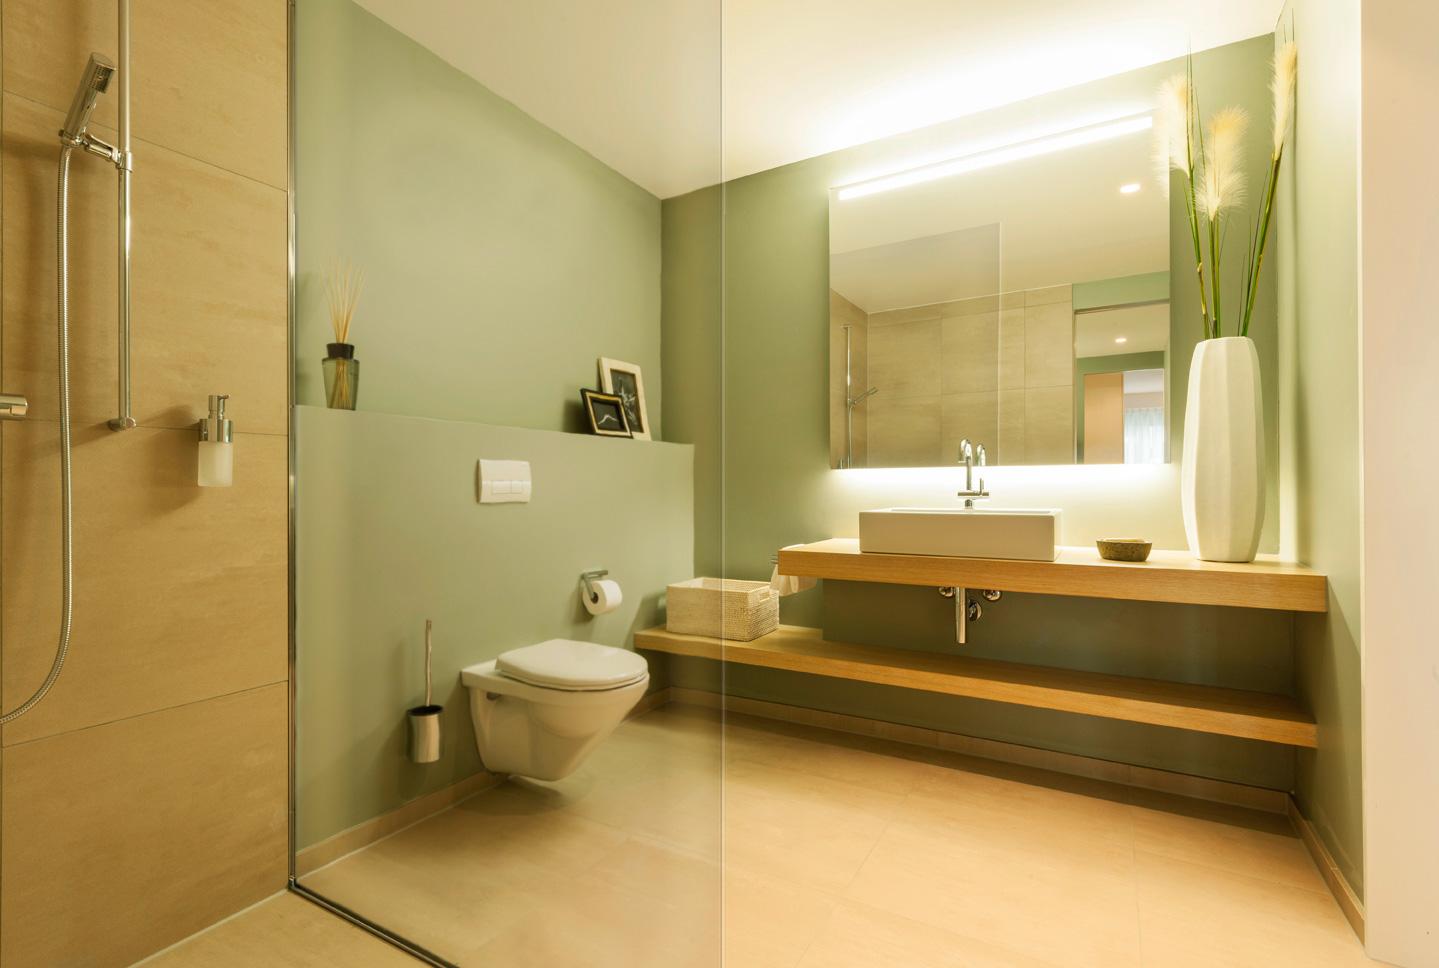 163_iria_degen_interiors_apartment_hardturmpark_zurich6.jpg